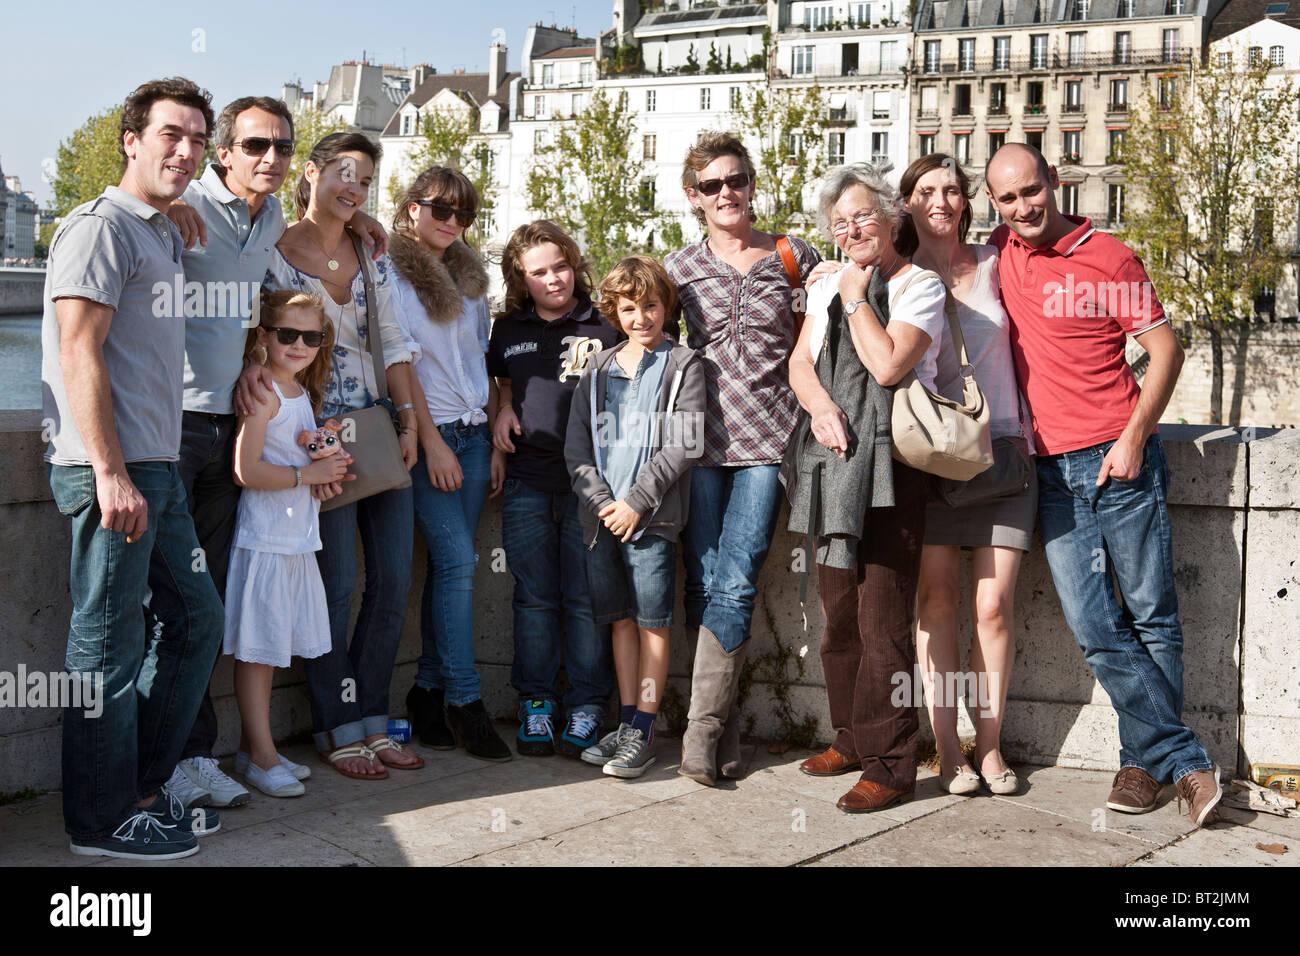 French matriarch poses for family portrait on Pont de la